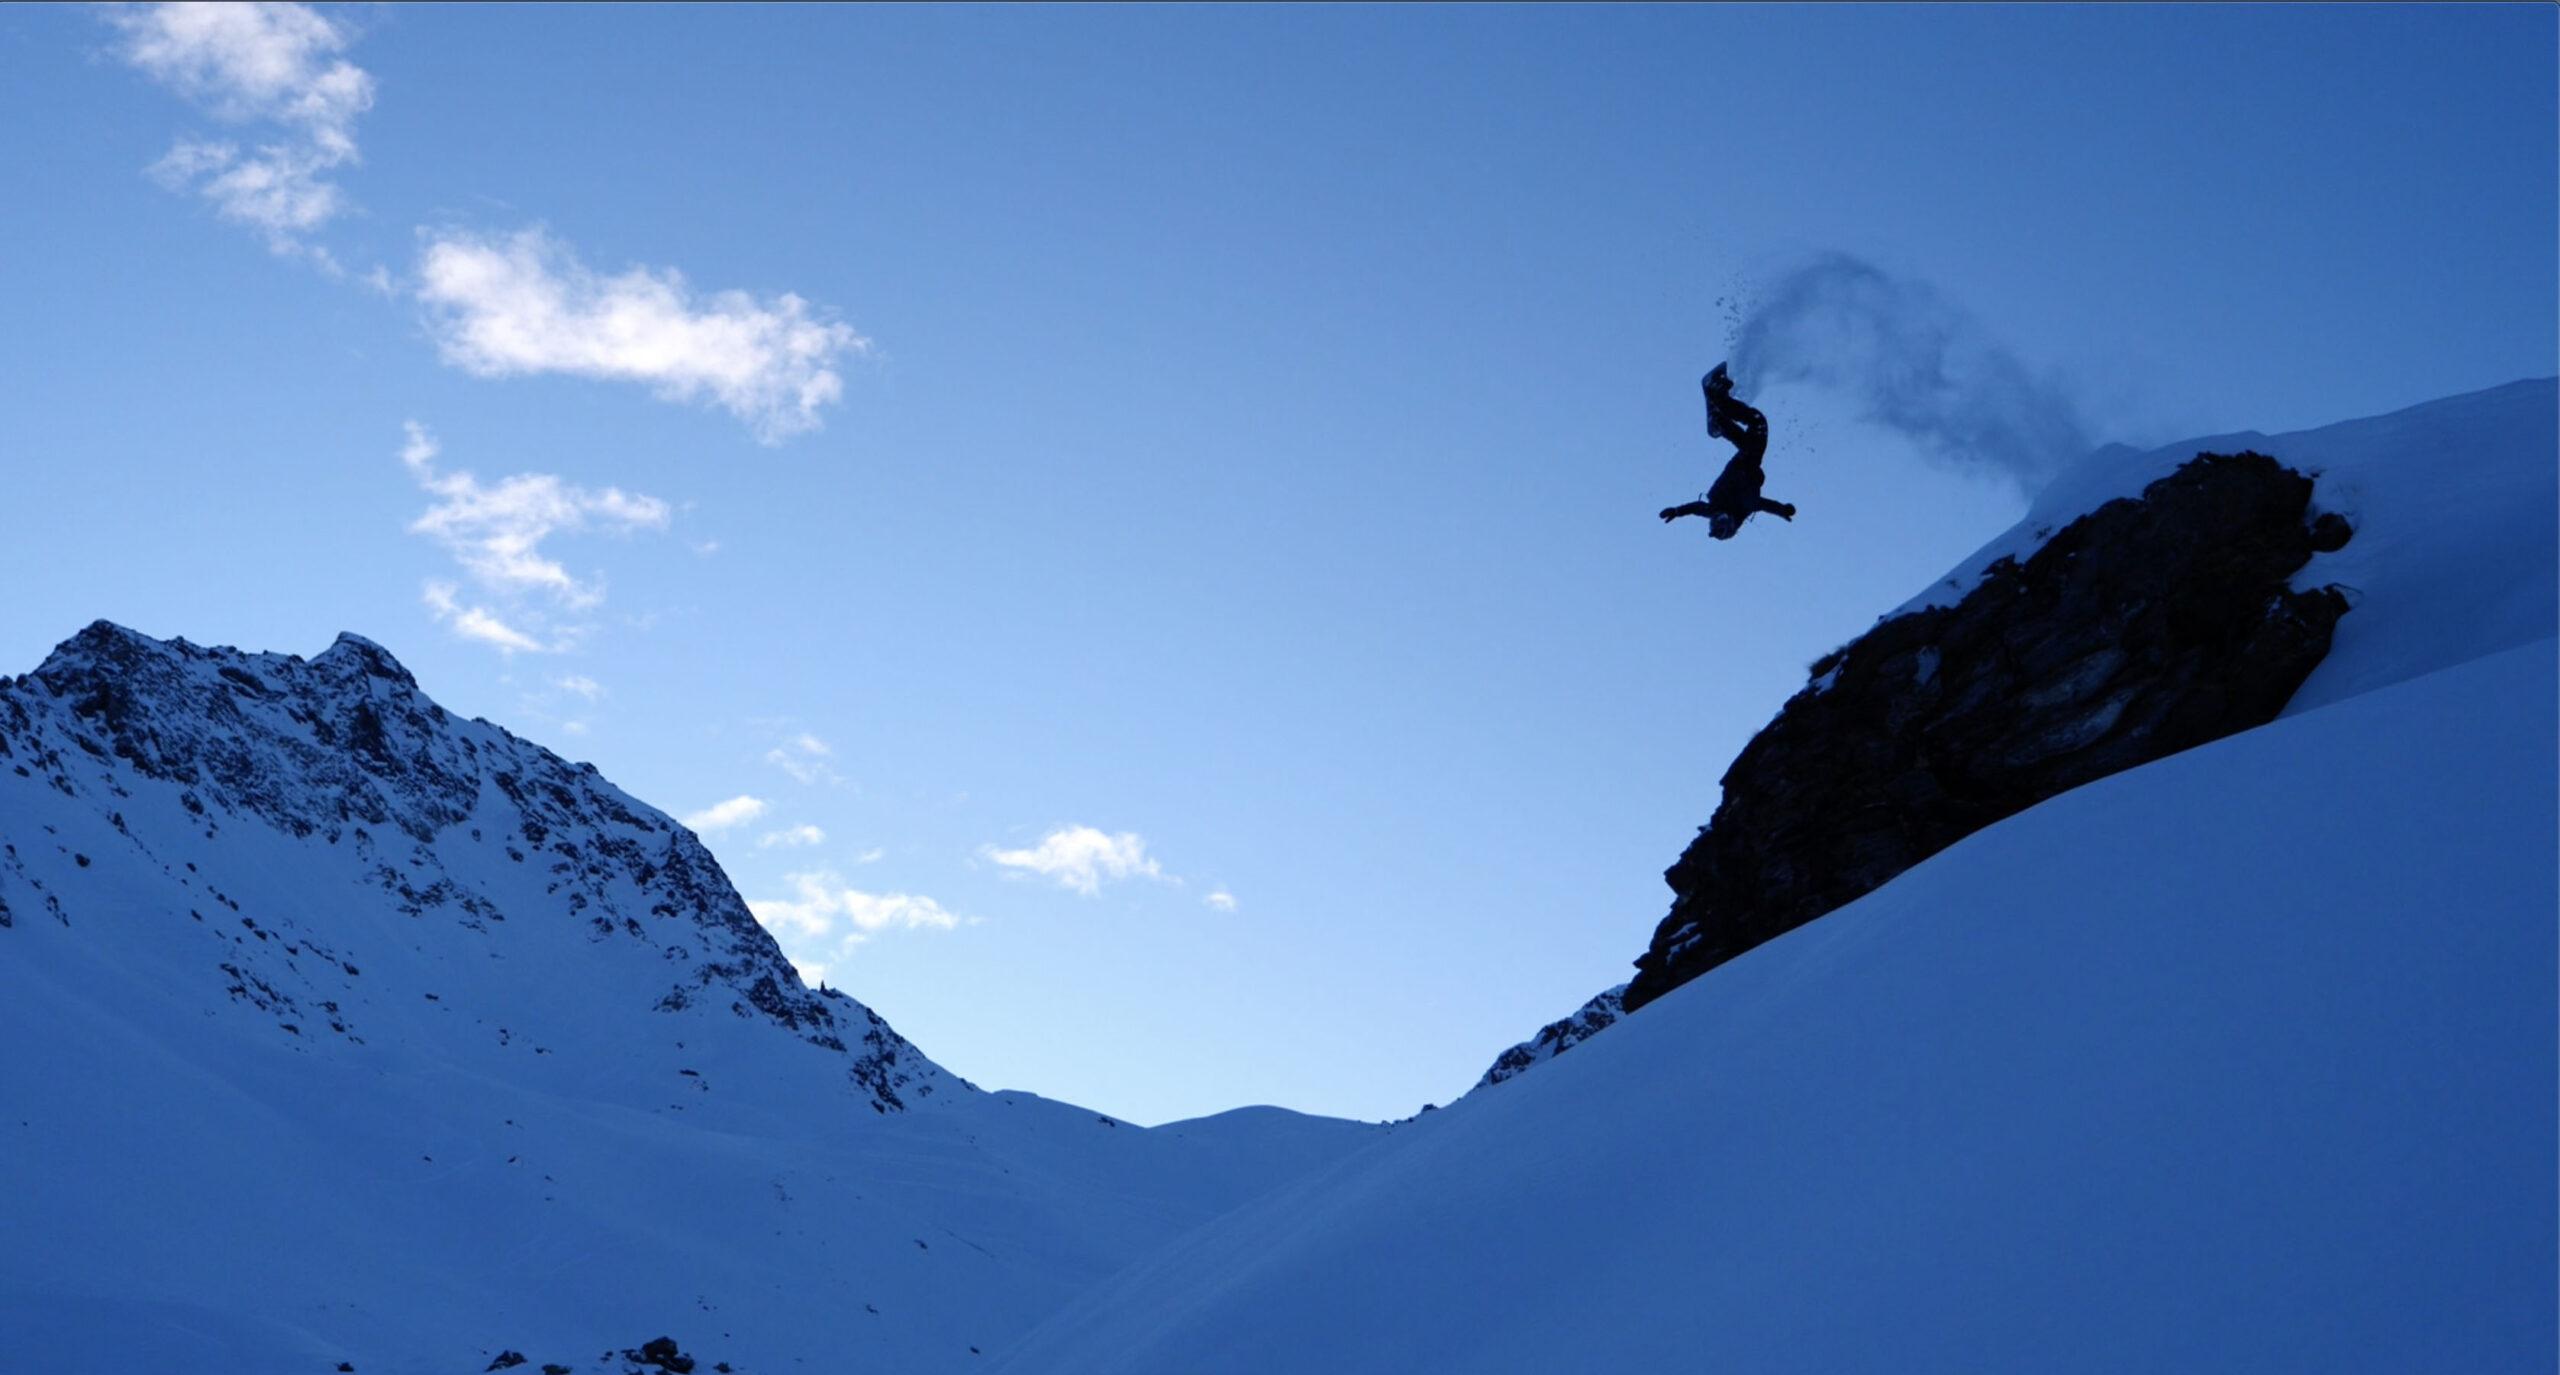 Snowboard – Eliot Daenzer : Par goût du risque